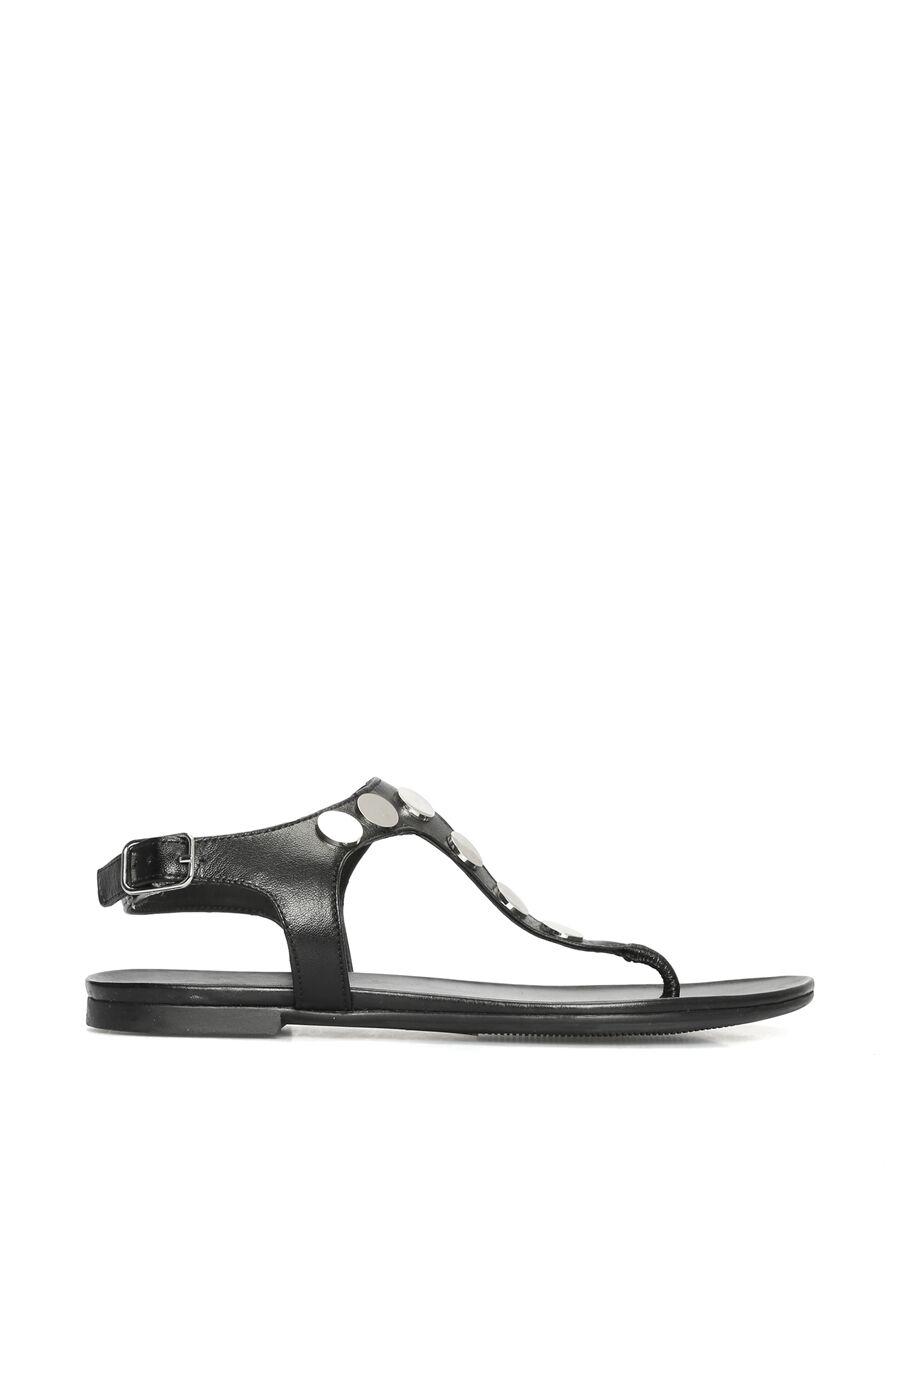 Dıvarese Taşlı Siyah Sandalet – 299.0 TL